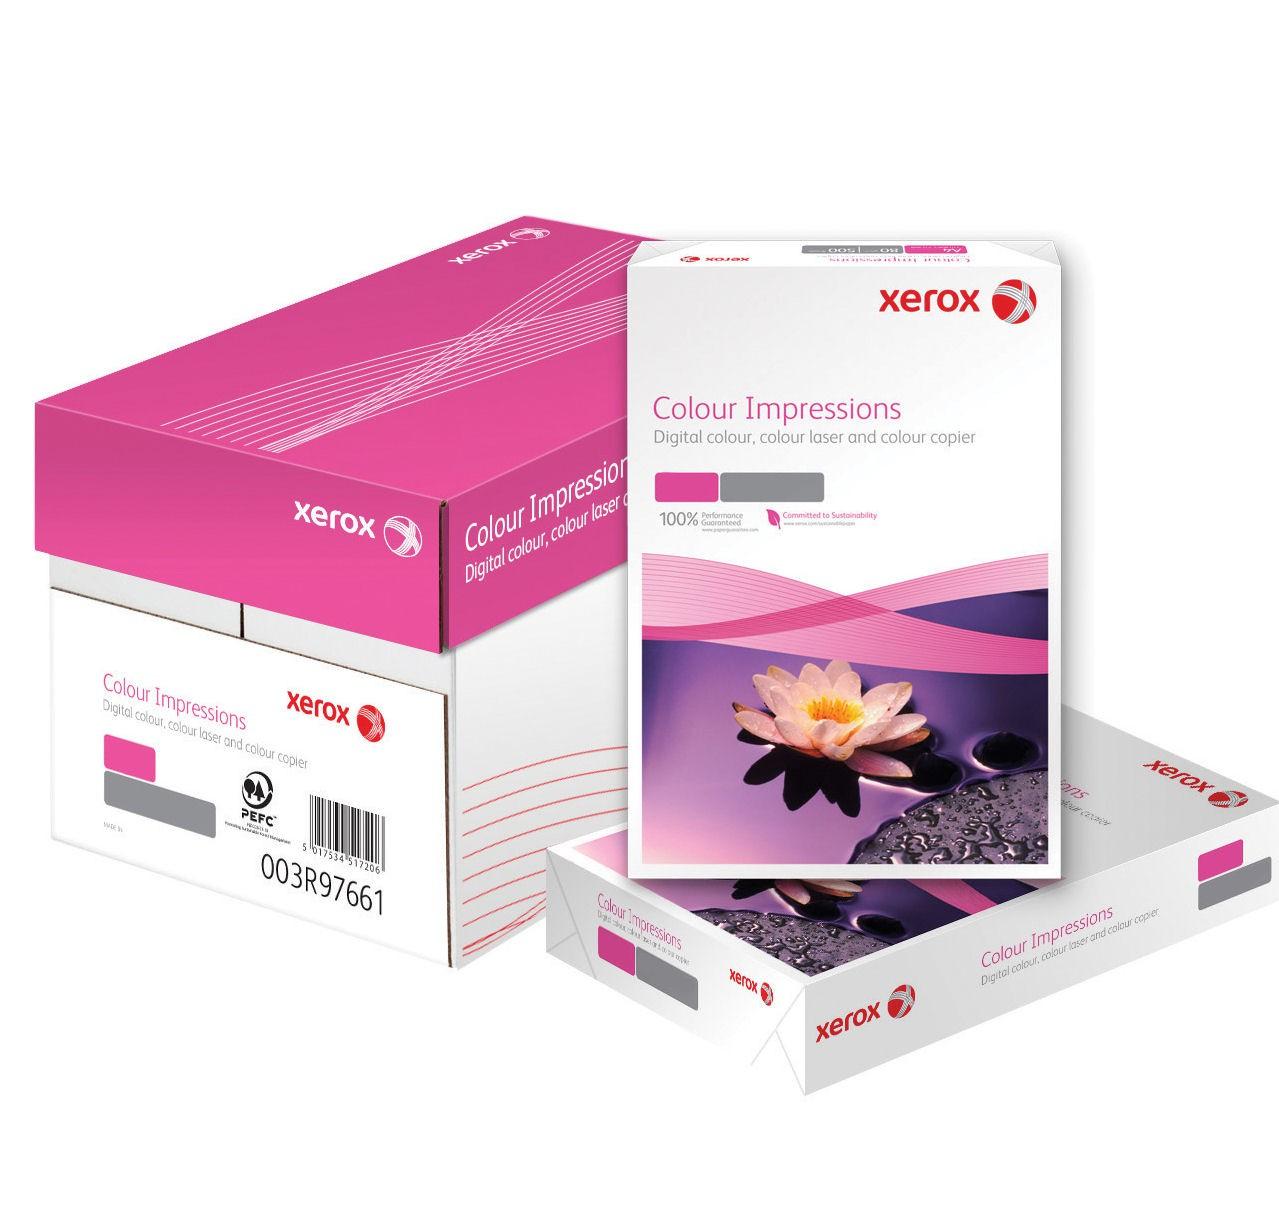 Xerox Colour Impressions A3 420X297mm PEFC 120Gm2 SG Pack 250 003R97669